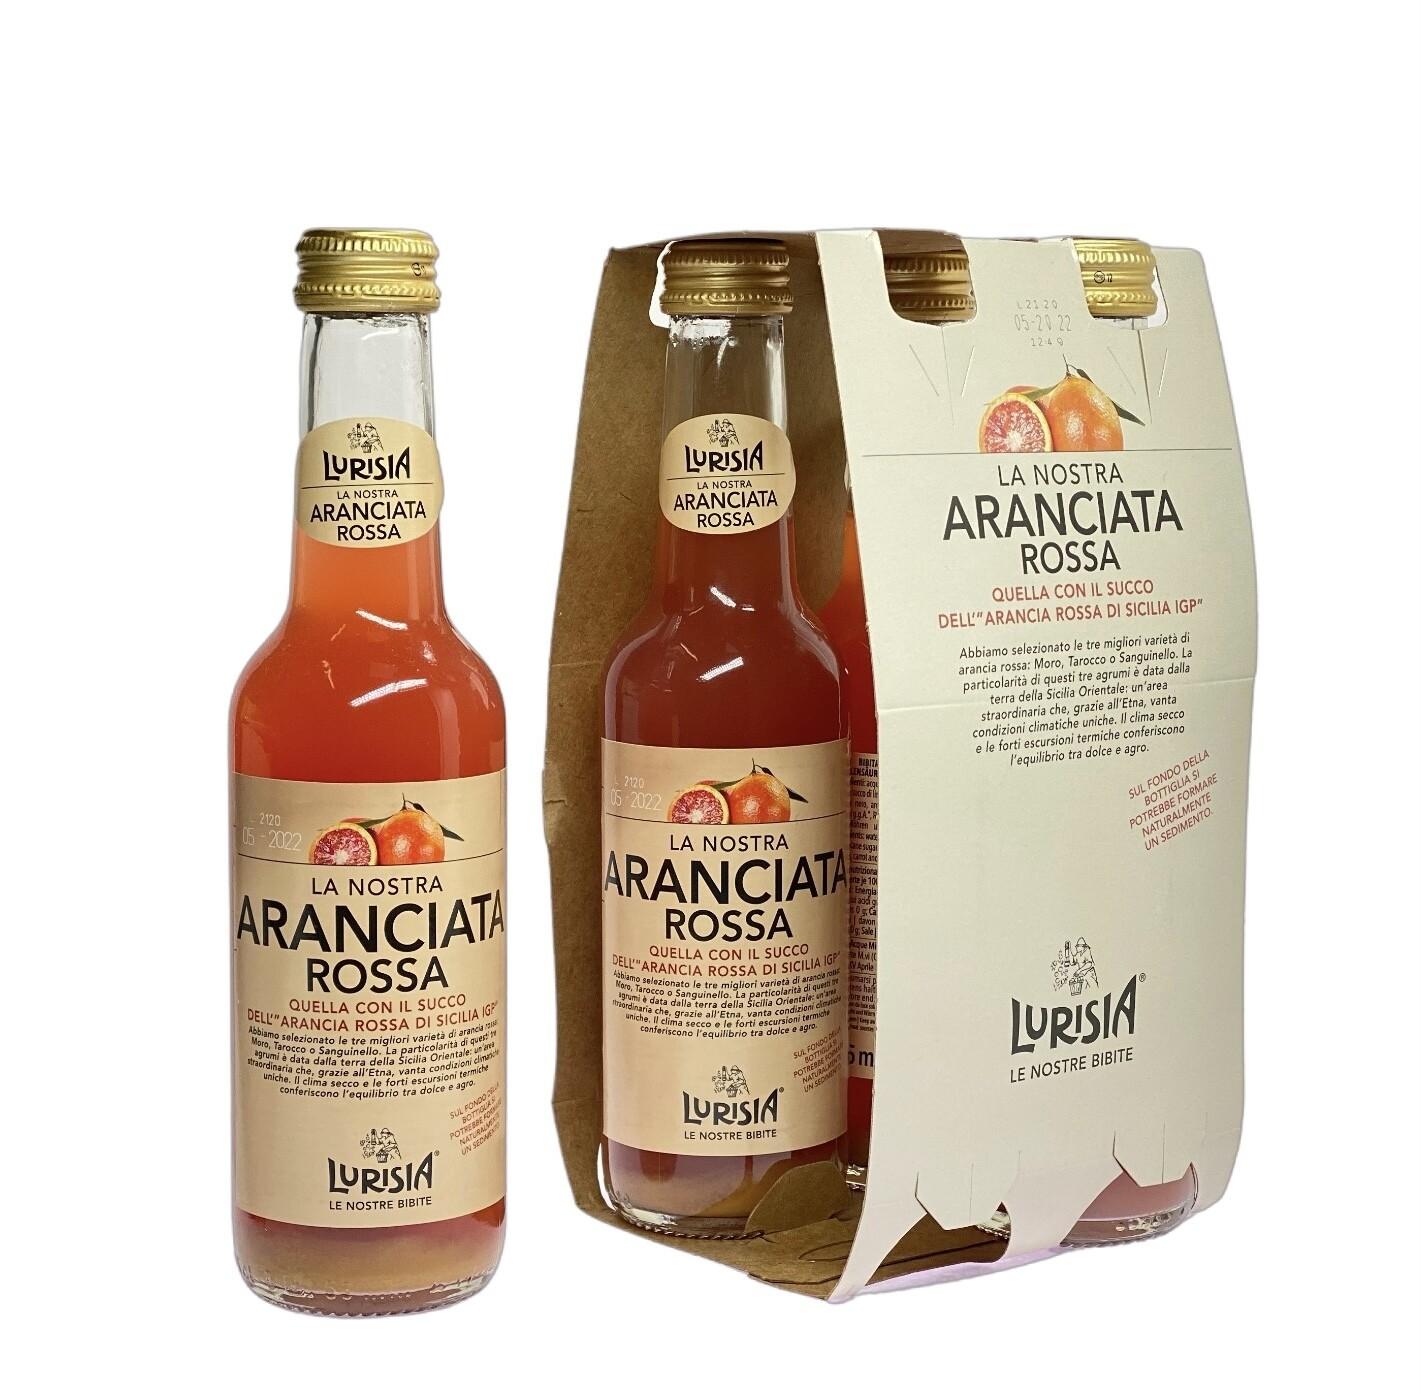 Aranciata Lurisia Arancia Rossa di Sicilia IGP 4 x 275 ml